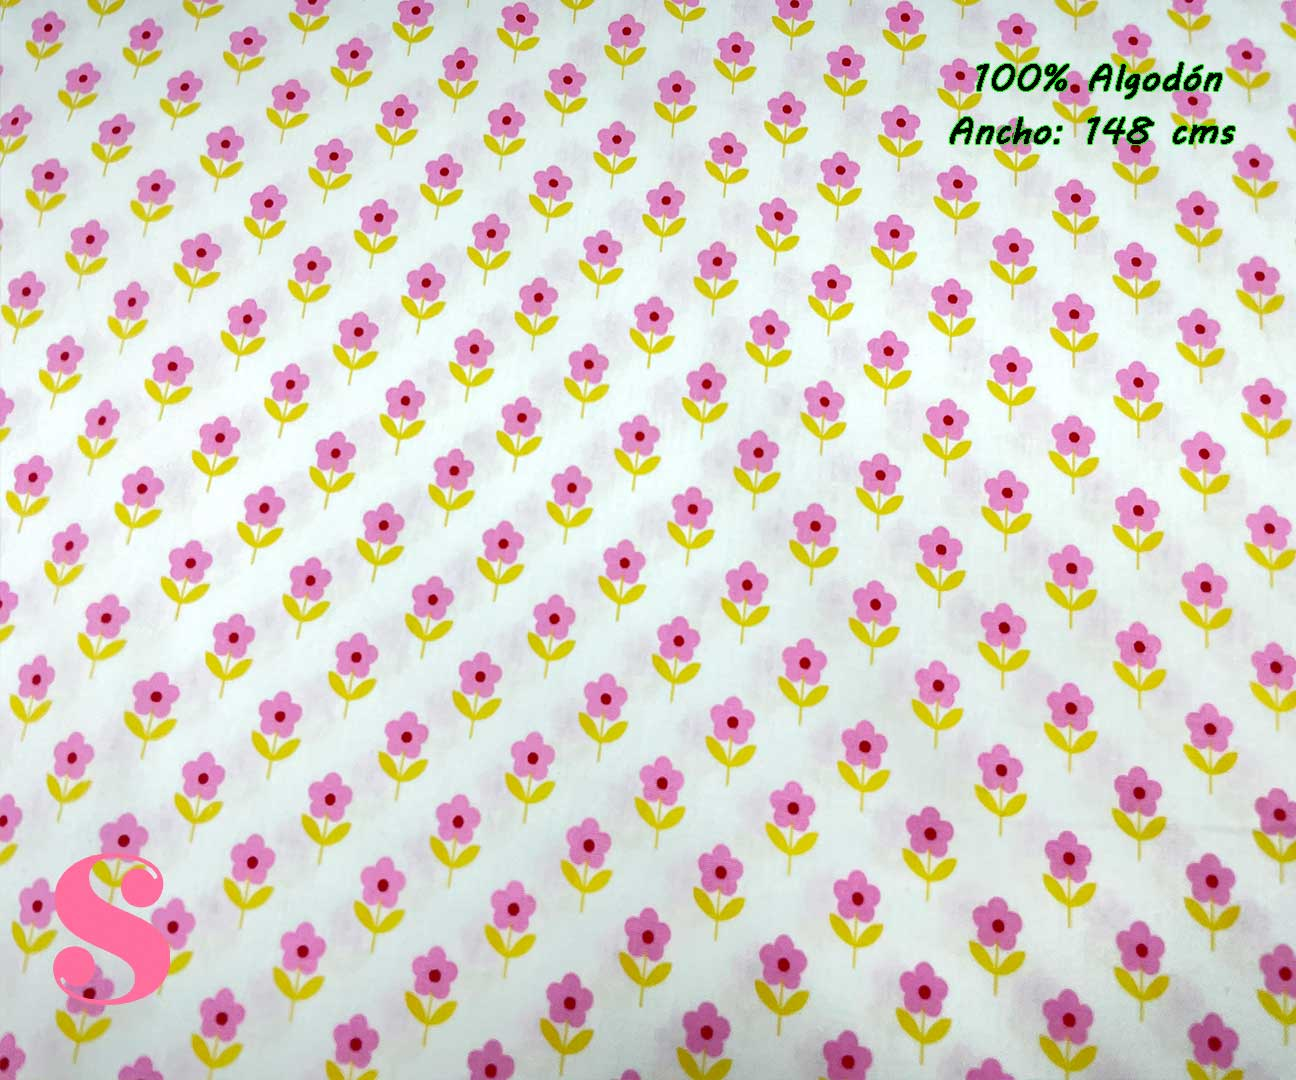 54-tela-estampada-flores,telas-dibujos-primaverales,telas-infantiles,tejidos-infantiles,Tejido Estampado Flower Power